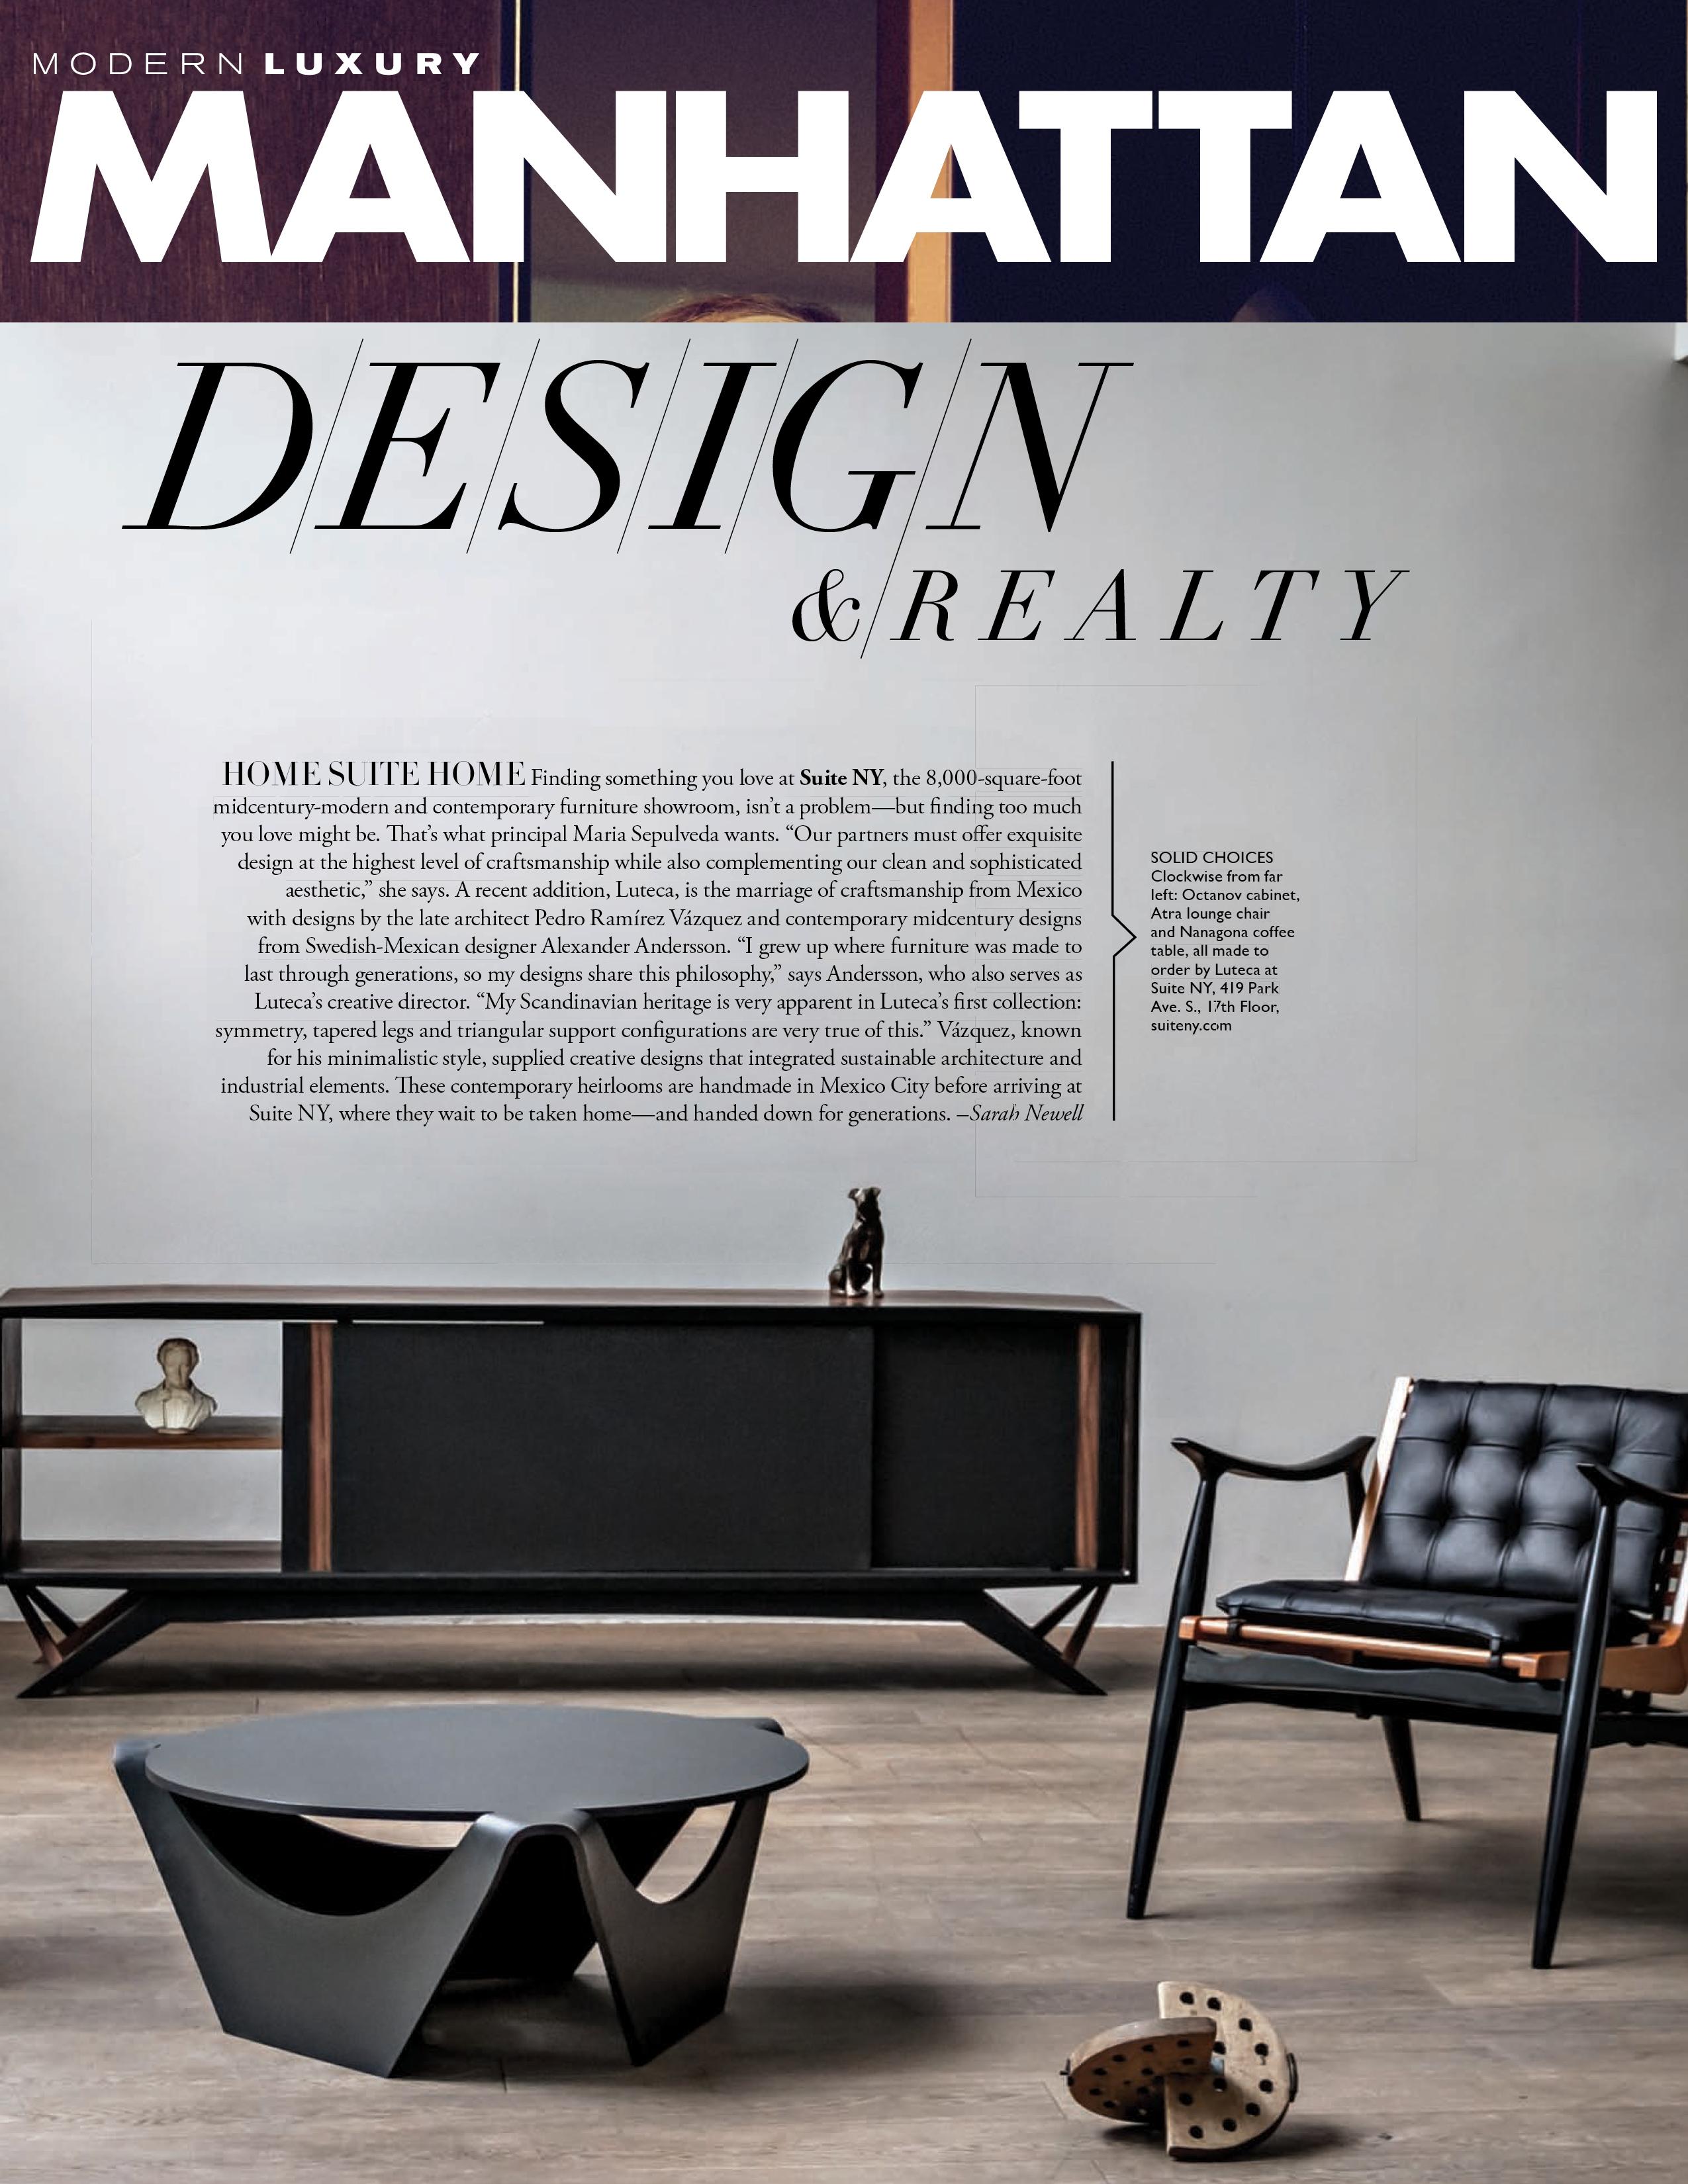 Luteca mexican designer furniture alexander andersson pedro ramirez vazquez atra chair